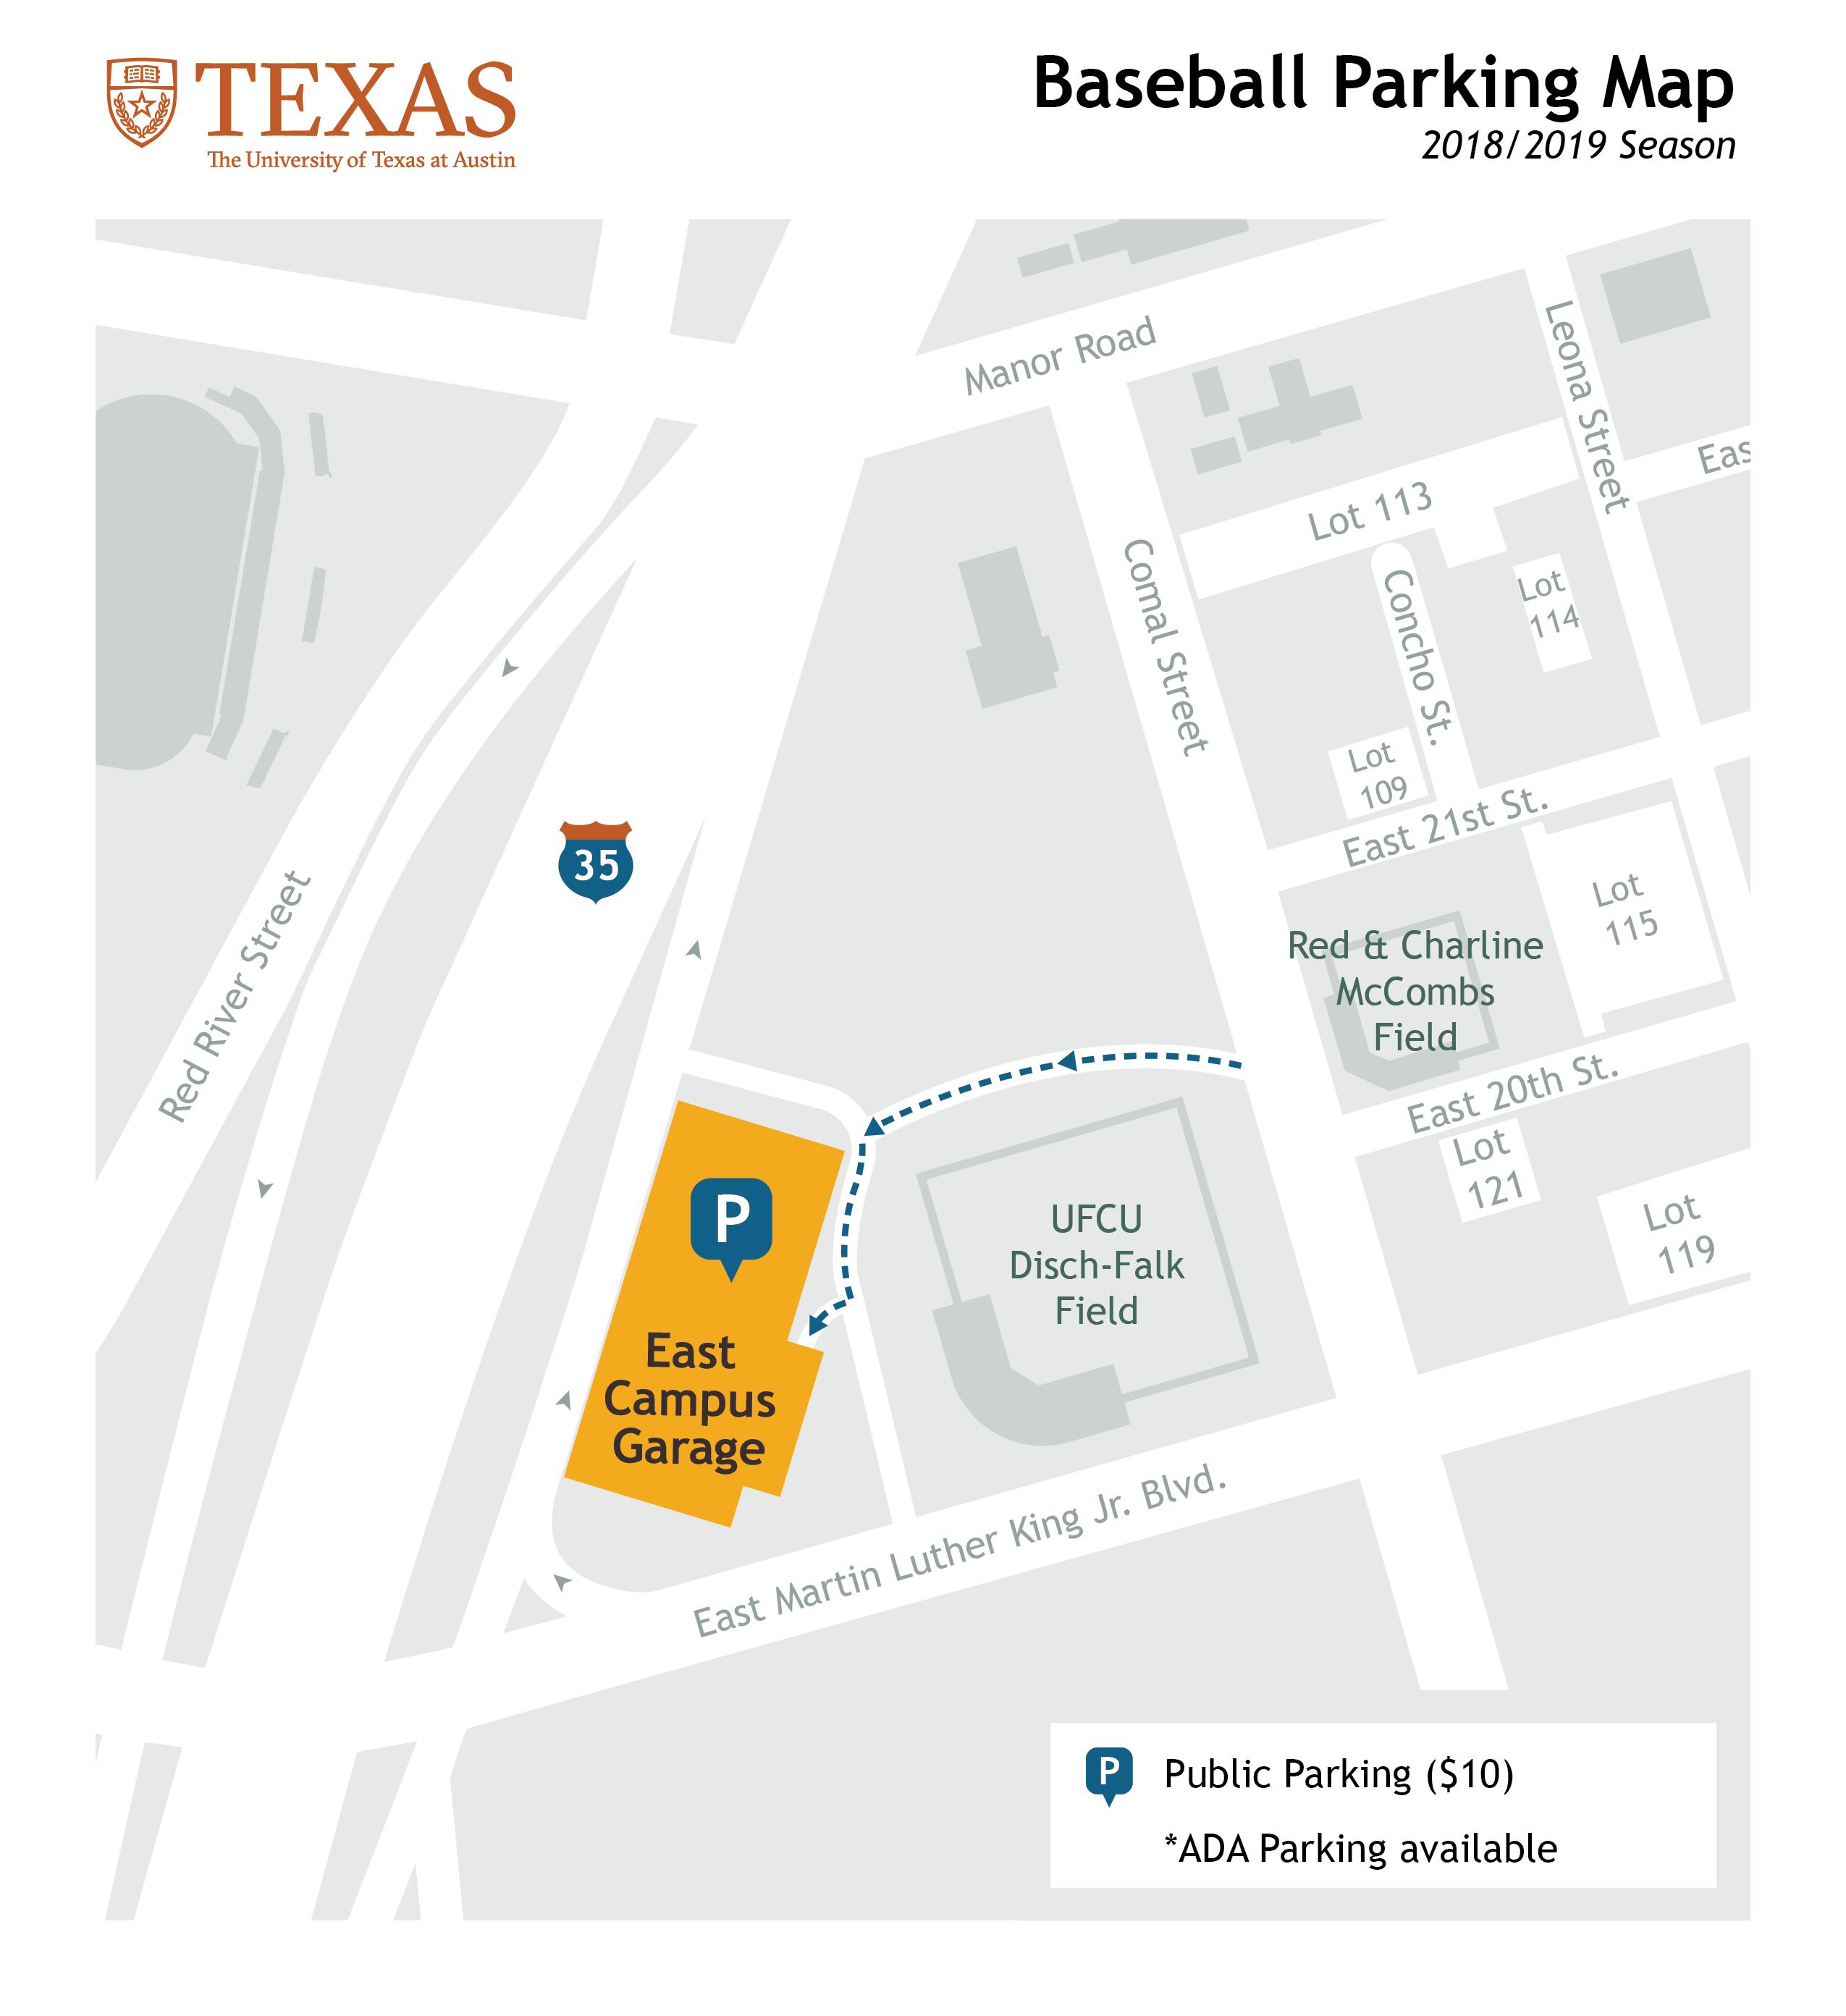 baseball parking 2019 map